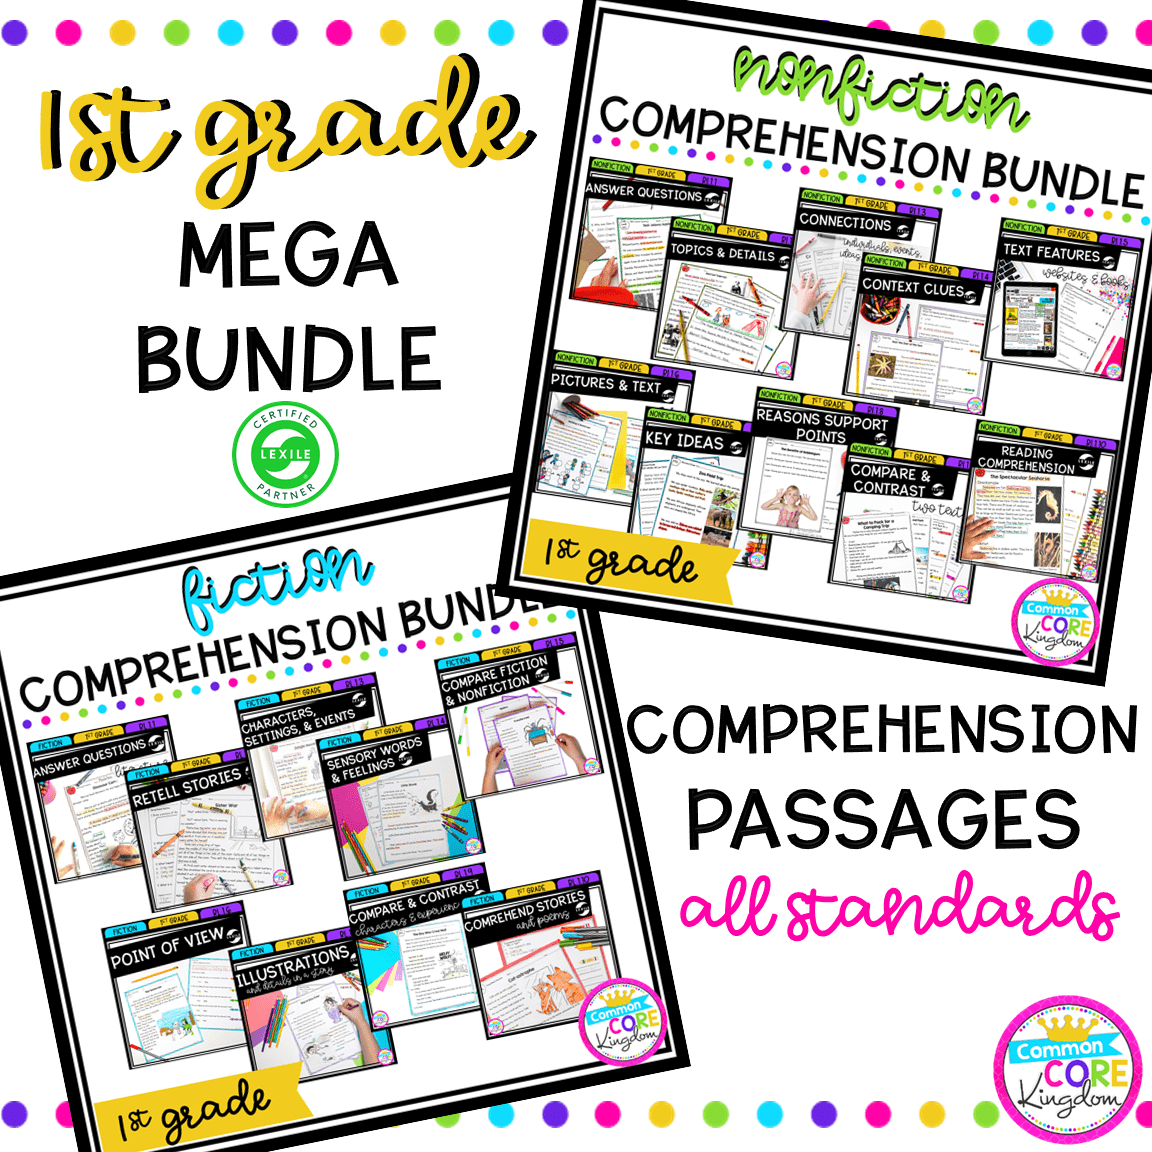 - 1st Grade Reading Comprehension MEGA Bundle Common Core Kingdom